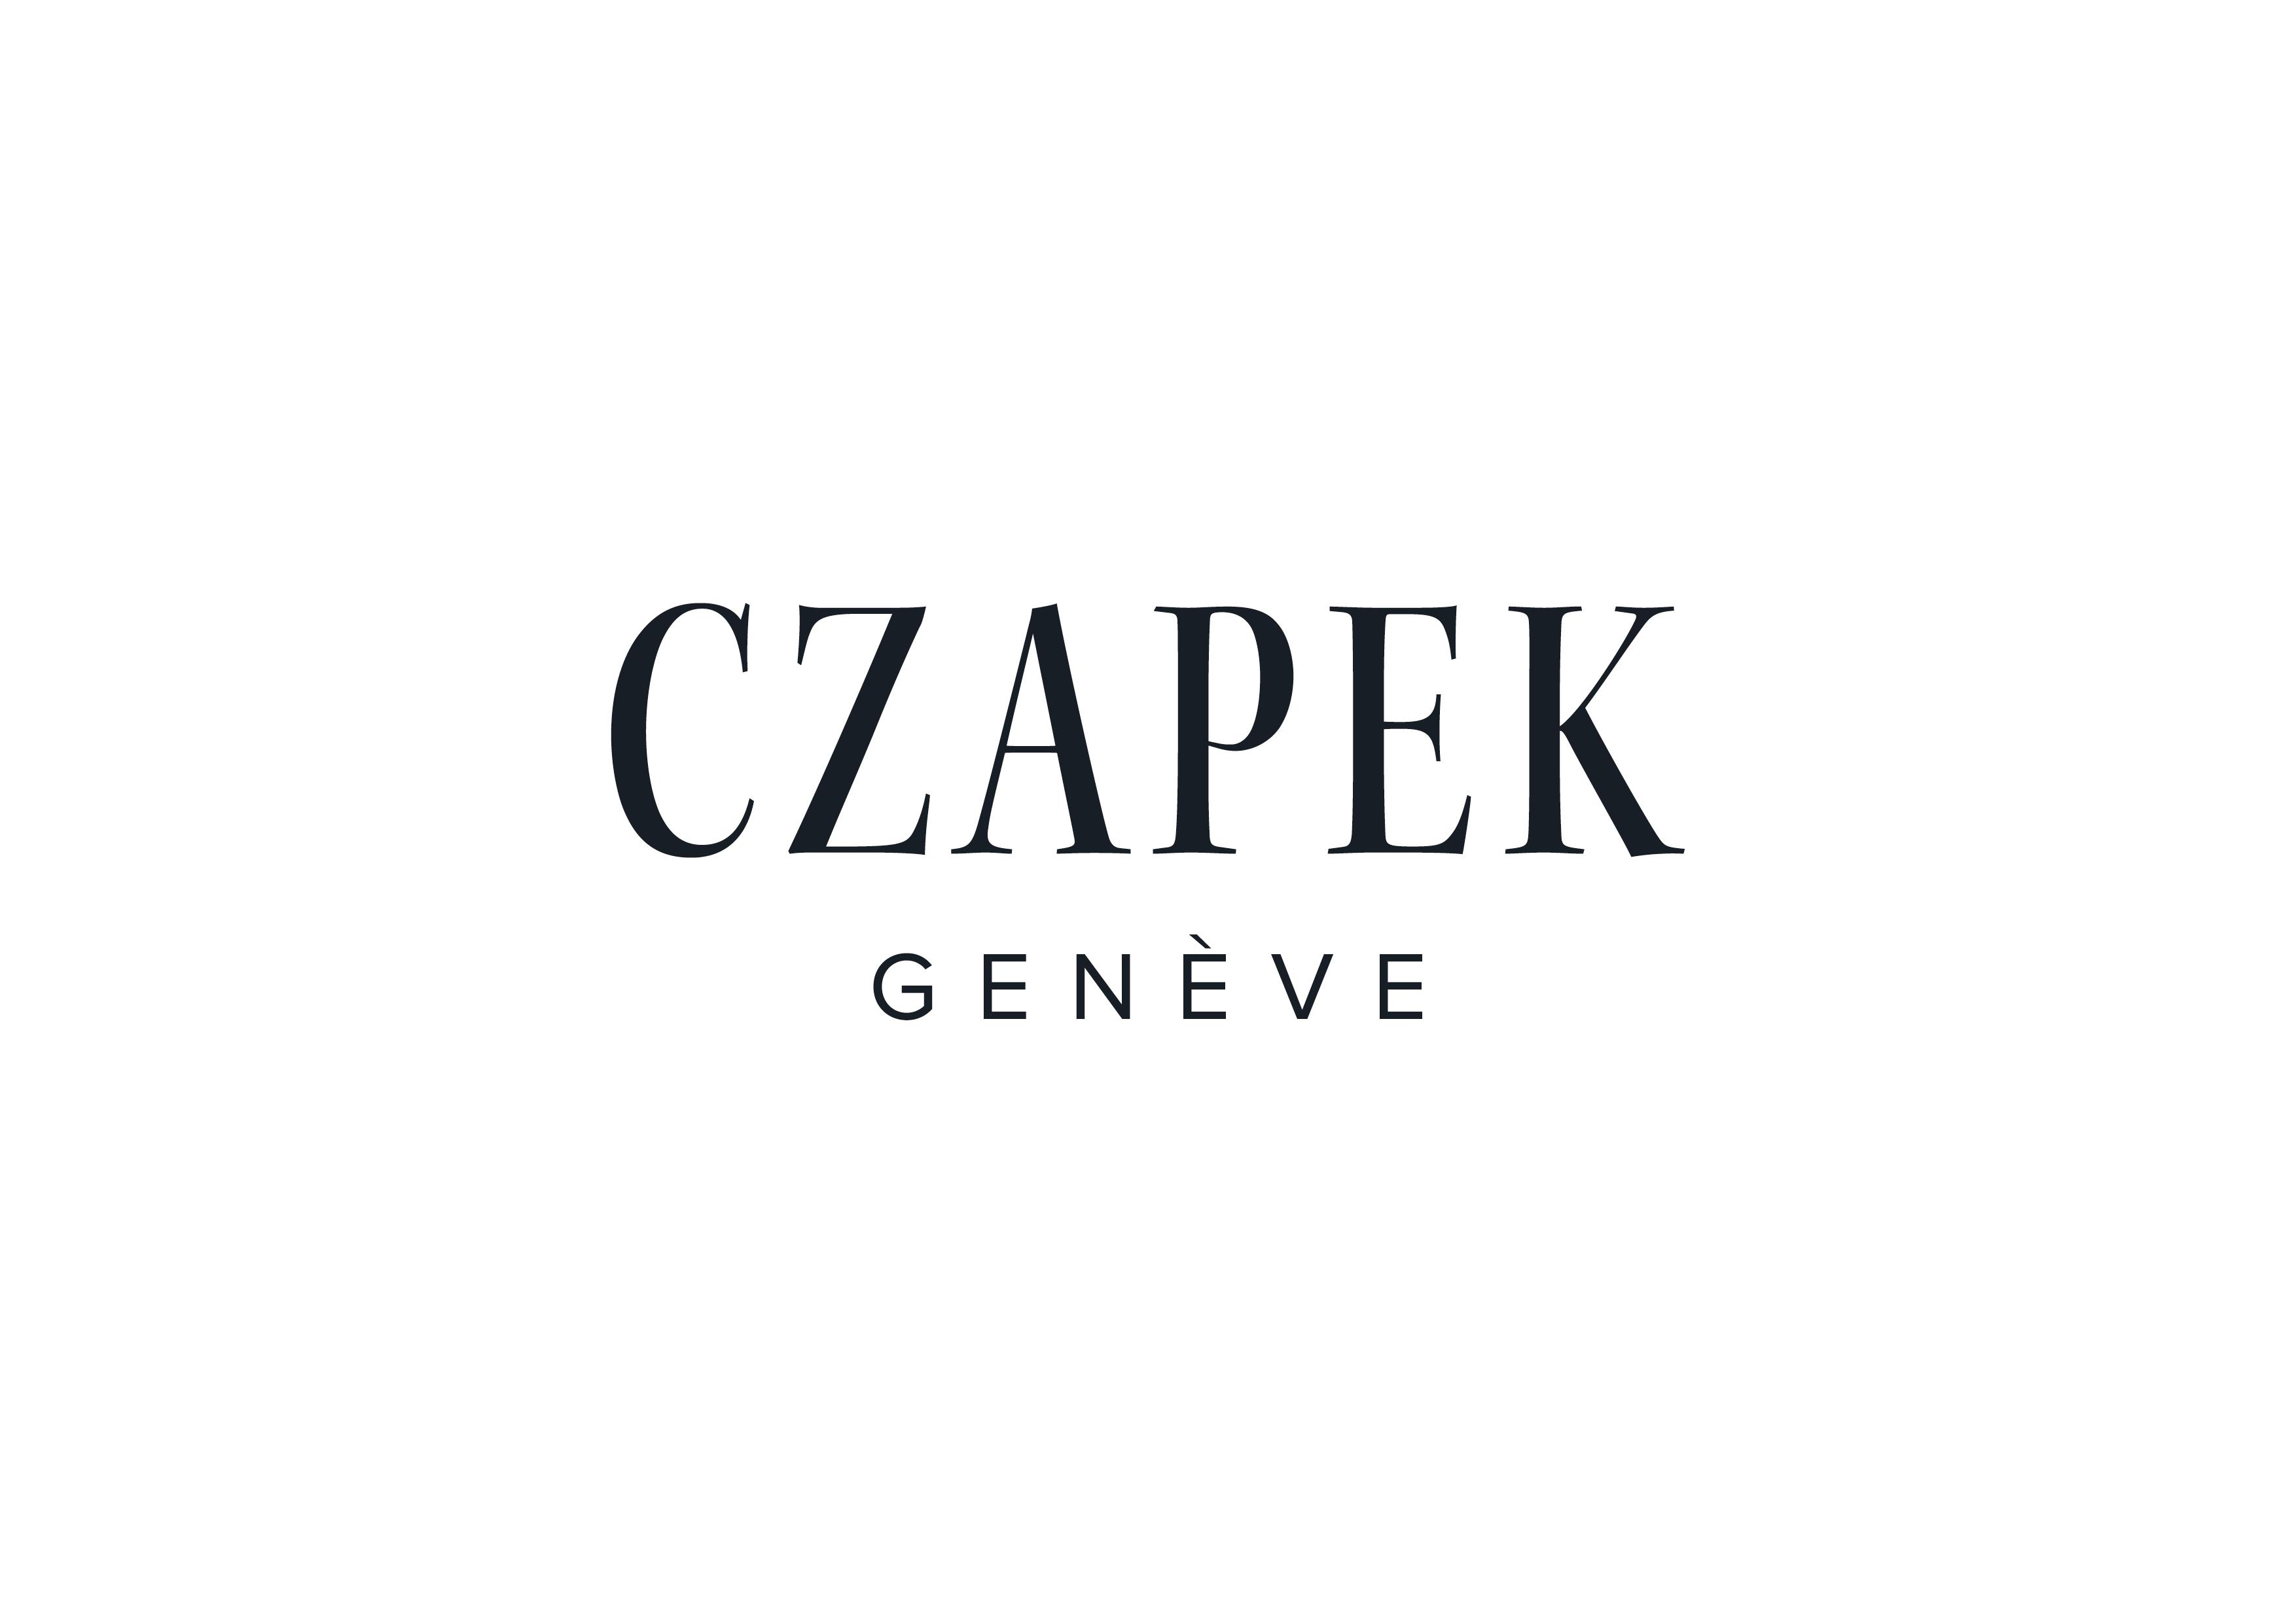 Czapek Geneve